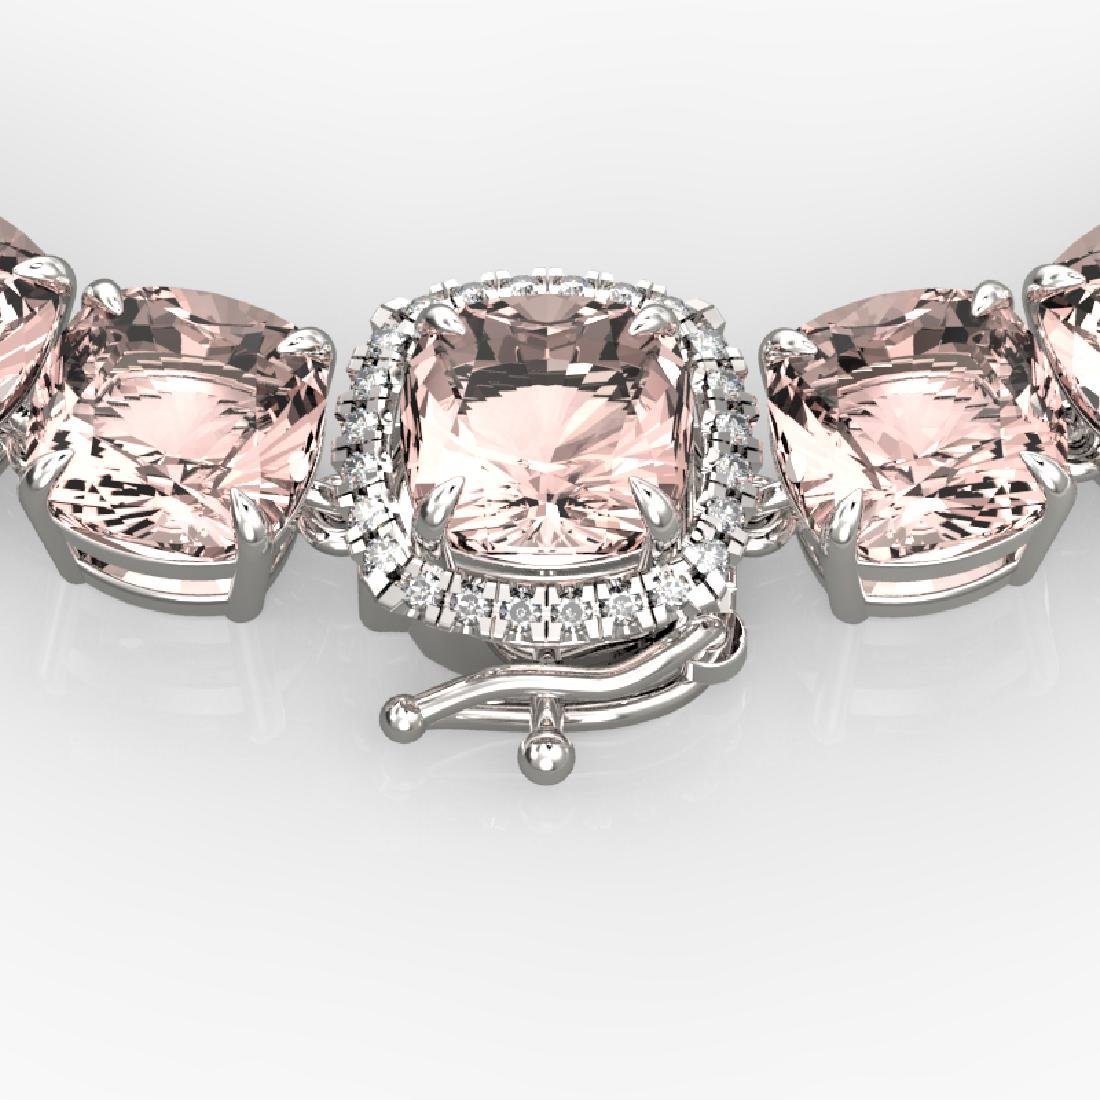 87 CTW Morganite & VS/SI Diamond Necklace 14K White